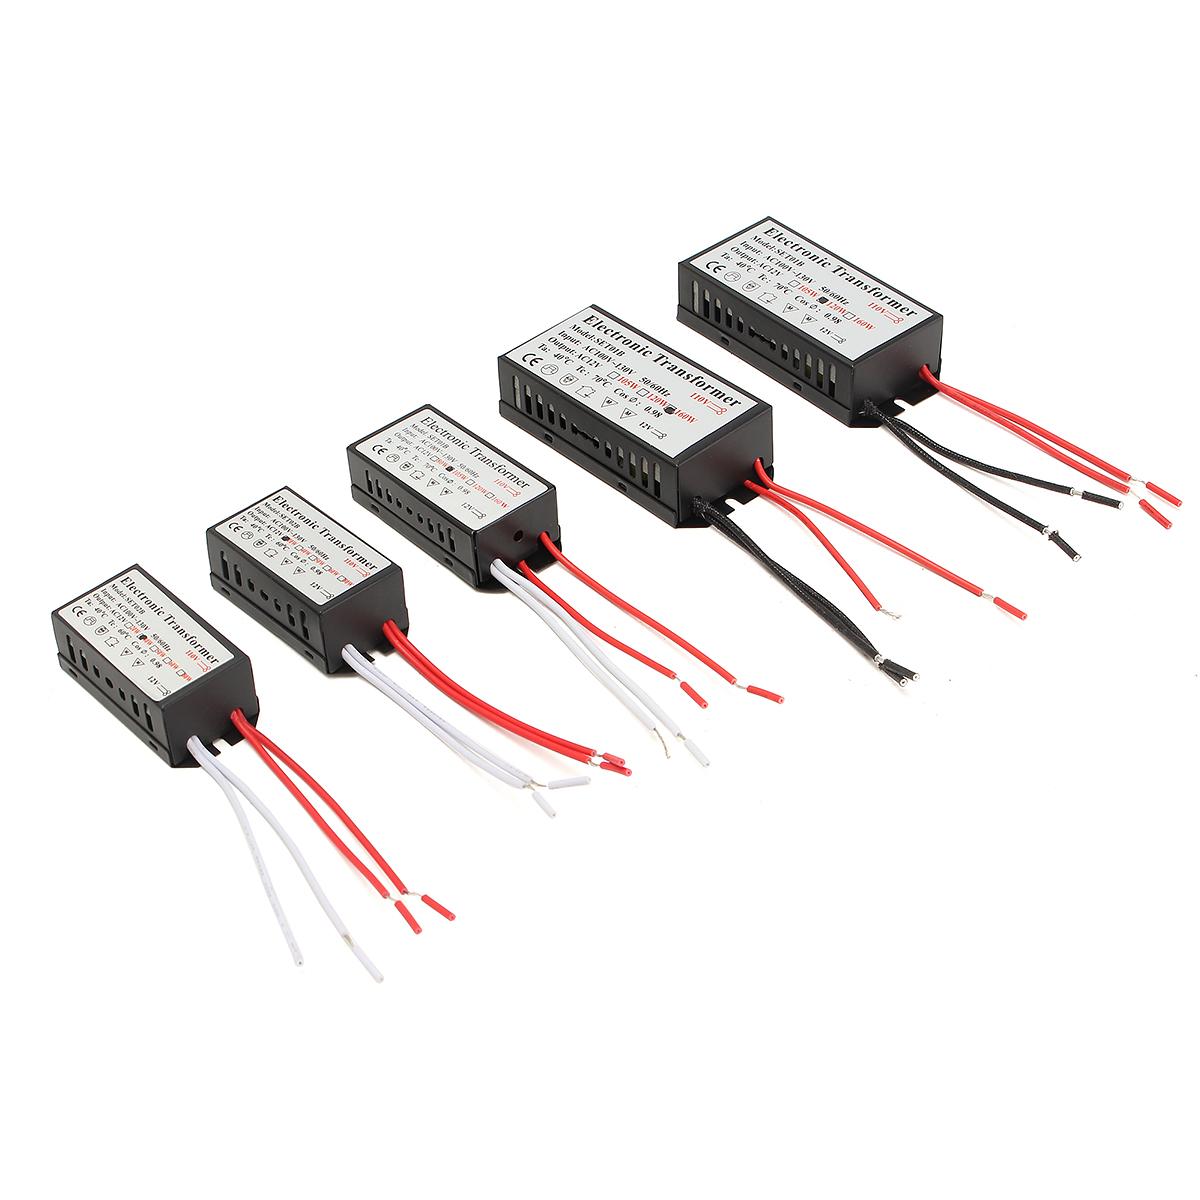 110 12 Volt Transformer Power Supply